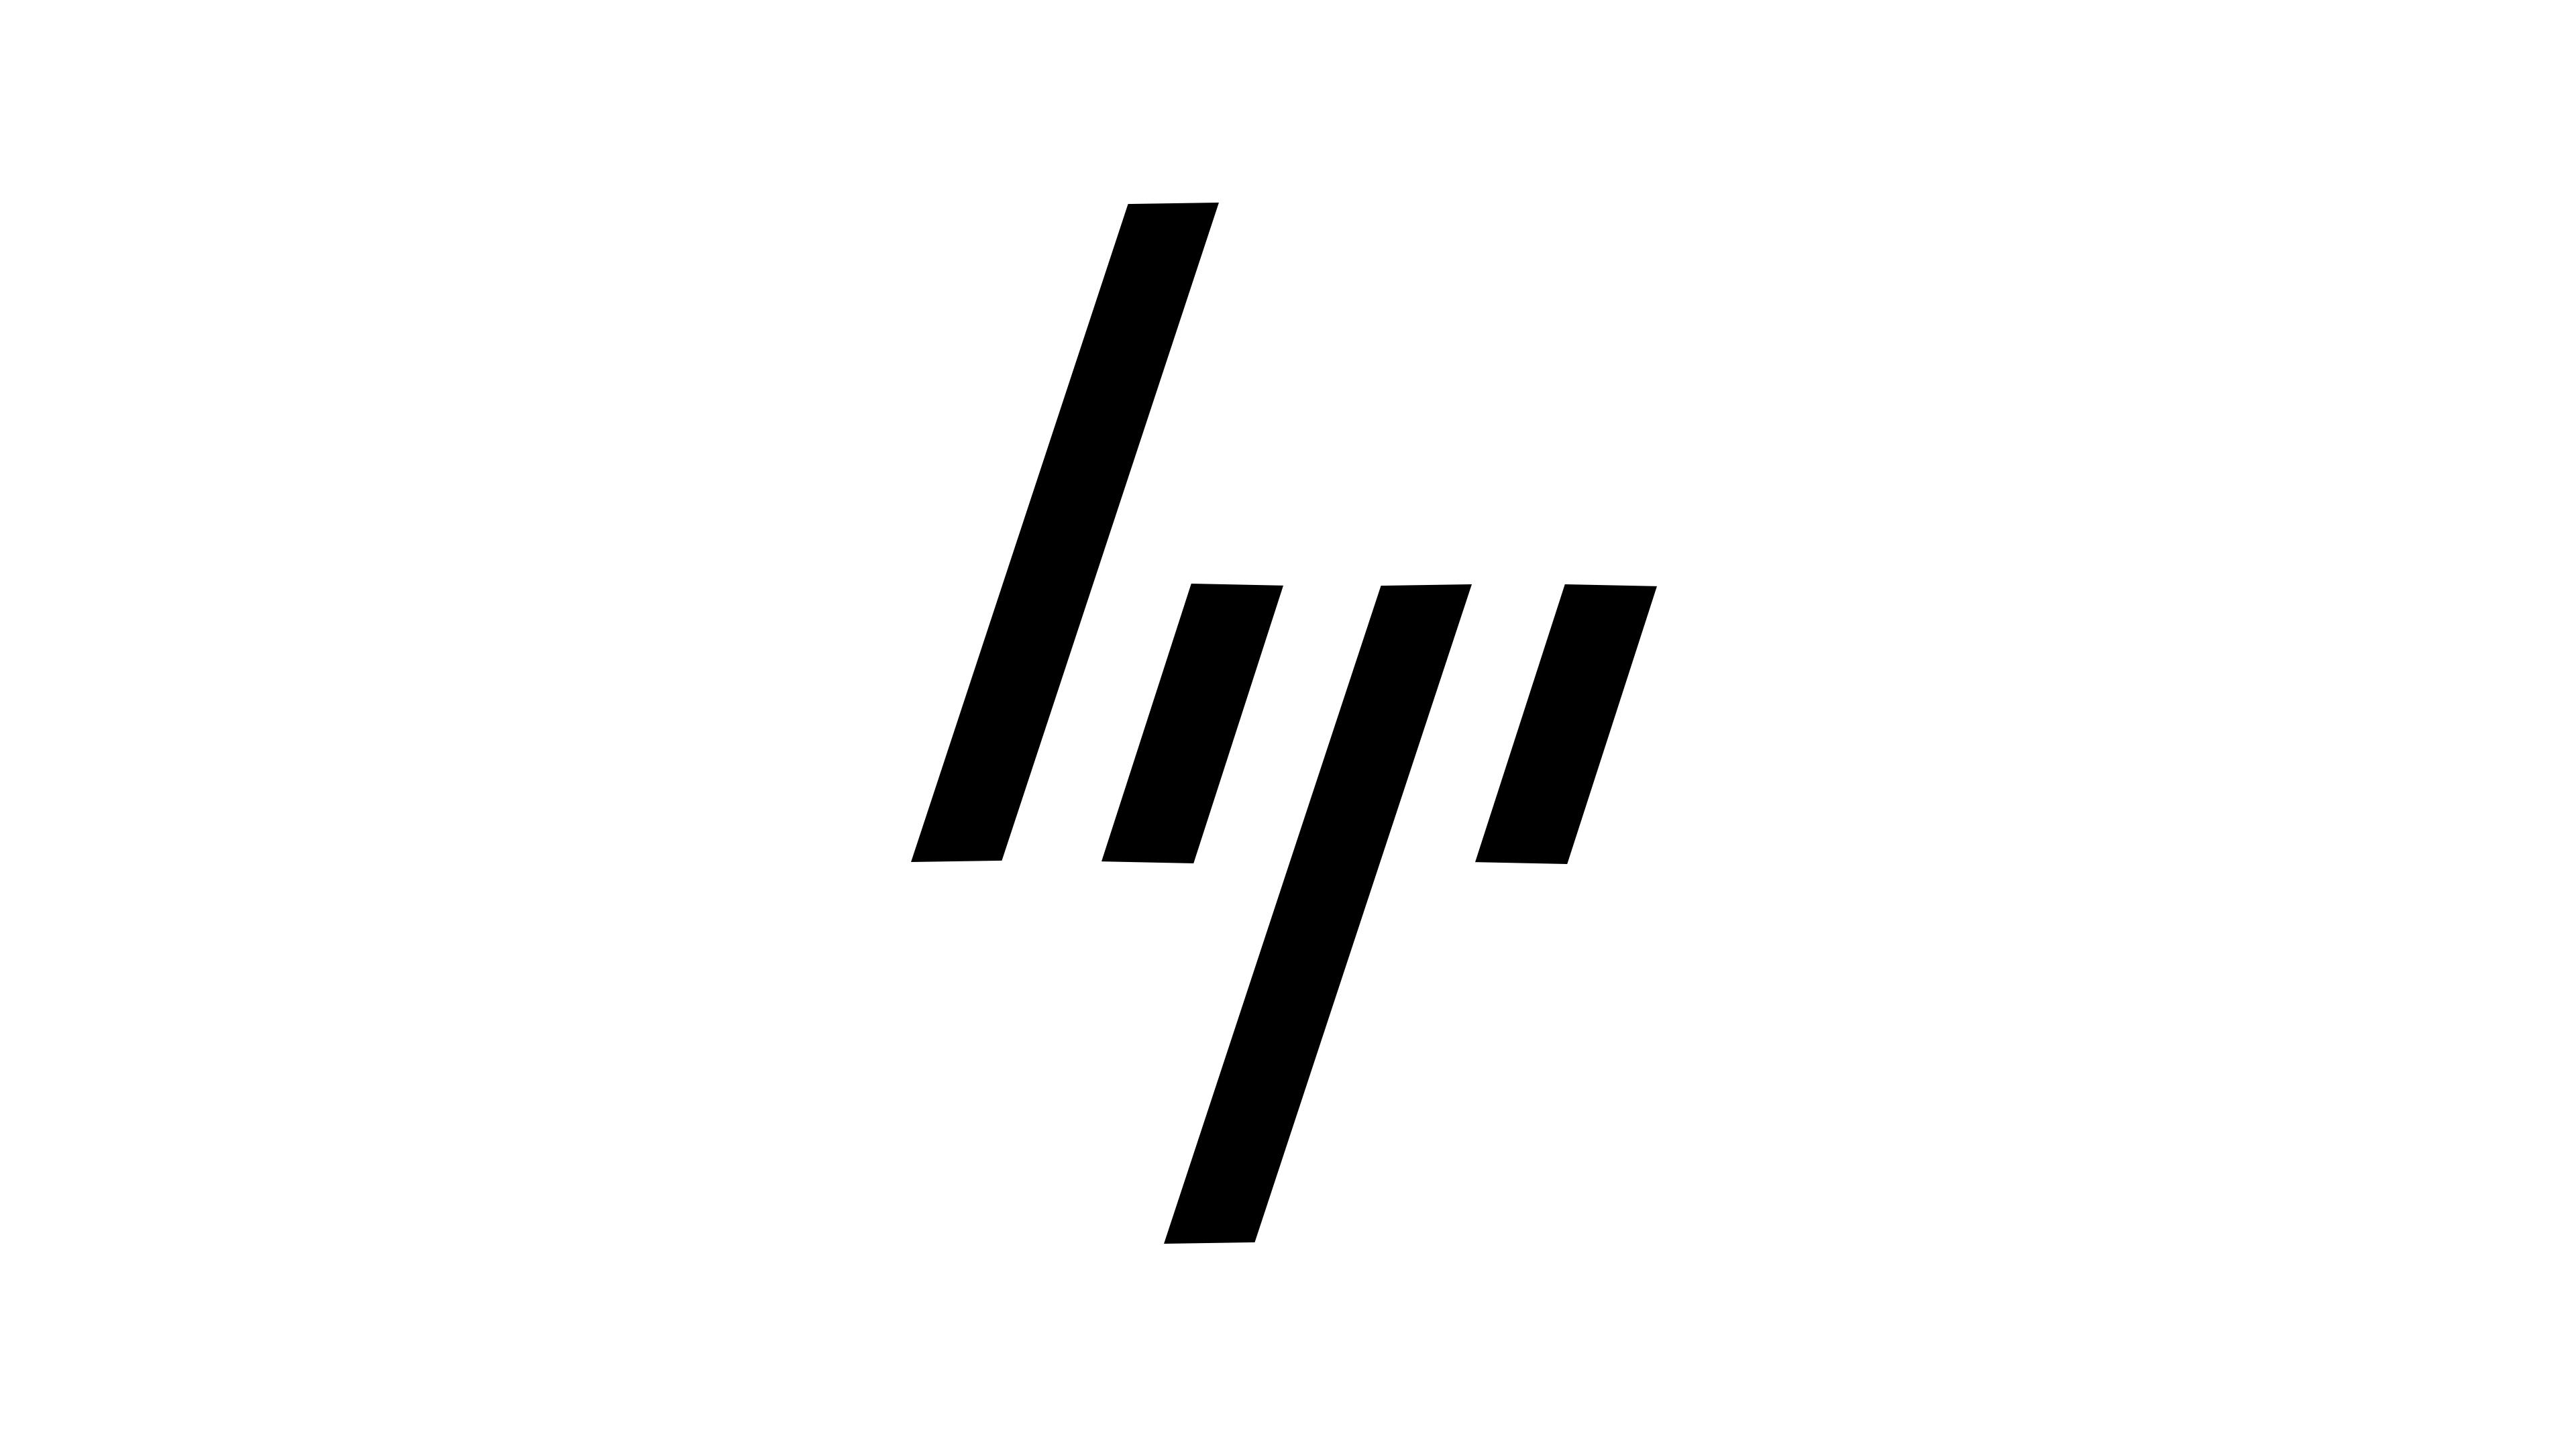 New HP logo 20k Ultra HD Wallpaper   Background Image   38200x20